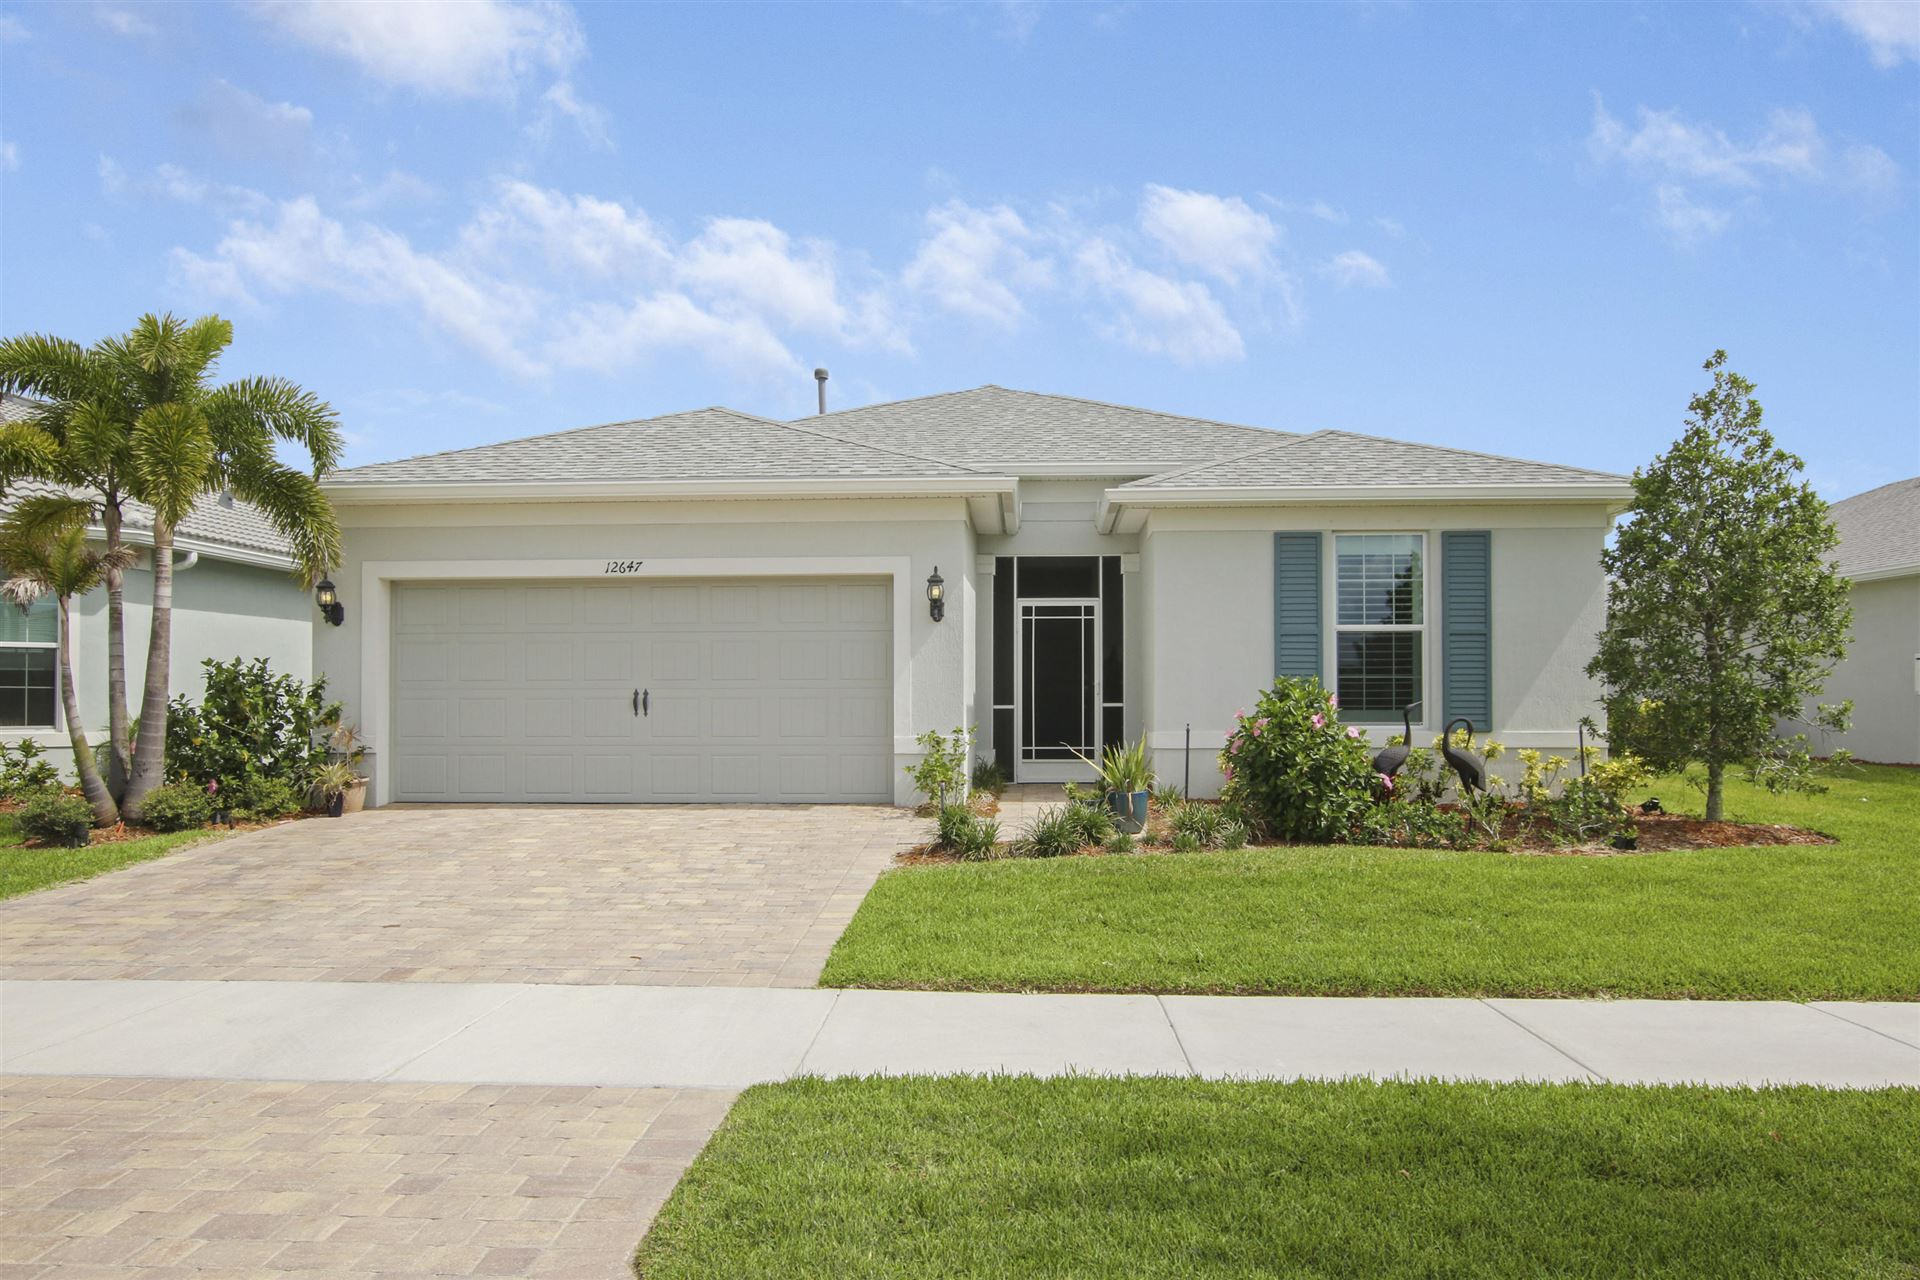 12647 SW Gingerline Drive, Port Saint Lucie, FL 34987 - MLS#: RX-10712866